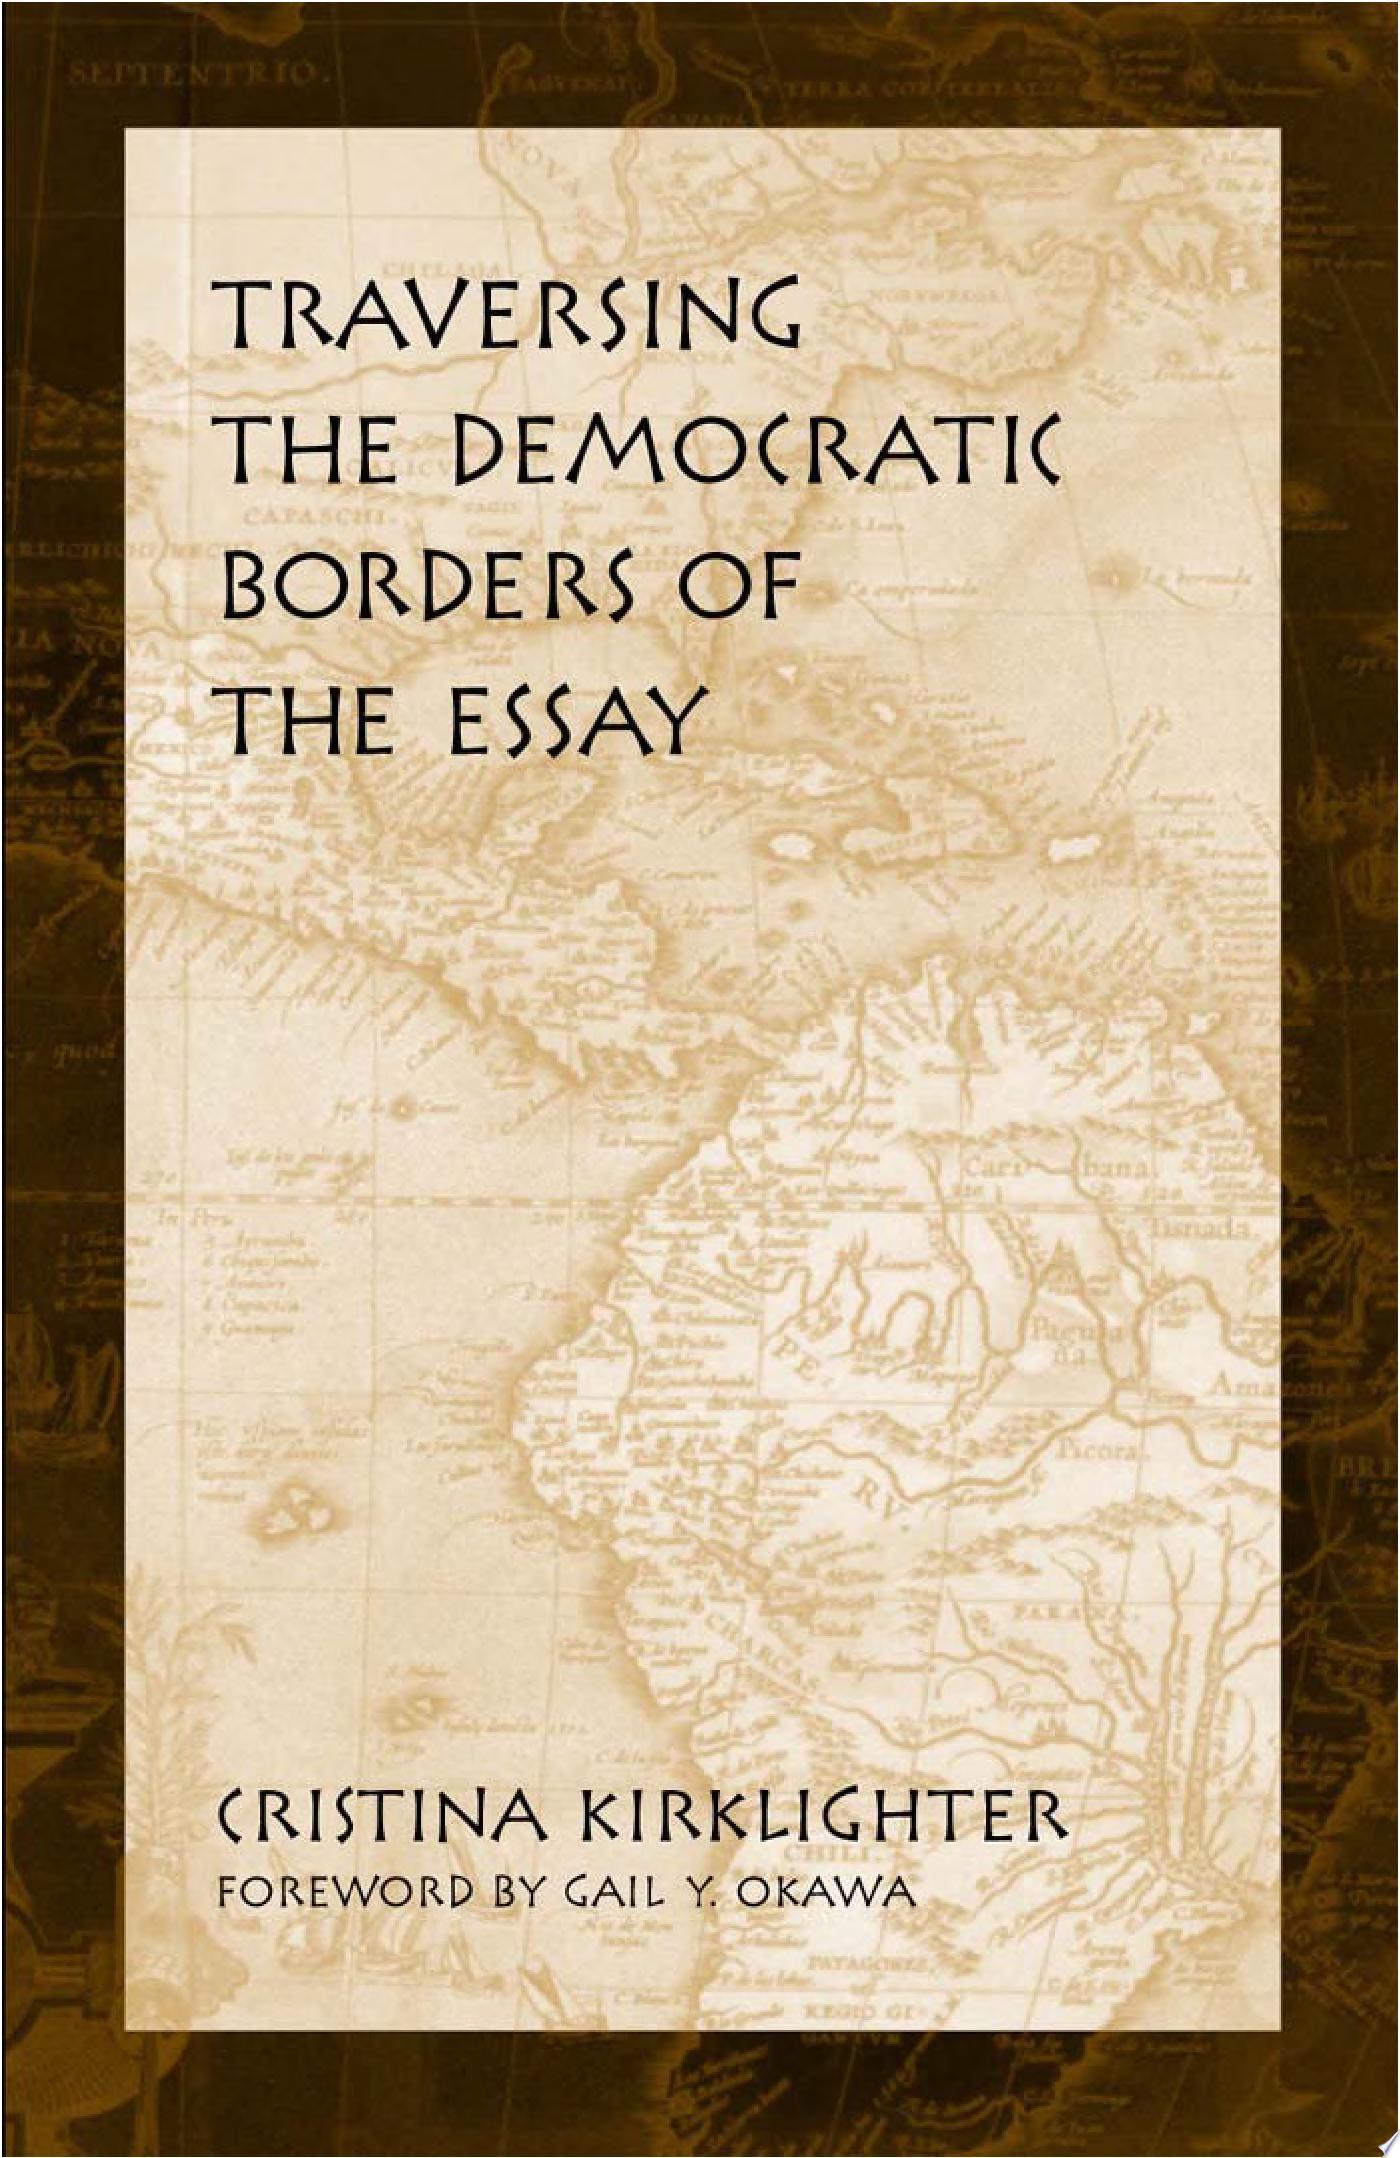 Traversing the Democratic Borders of the Essay